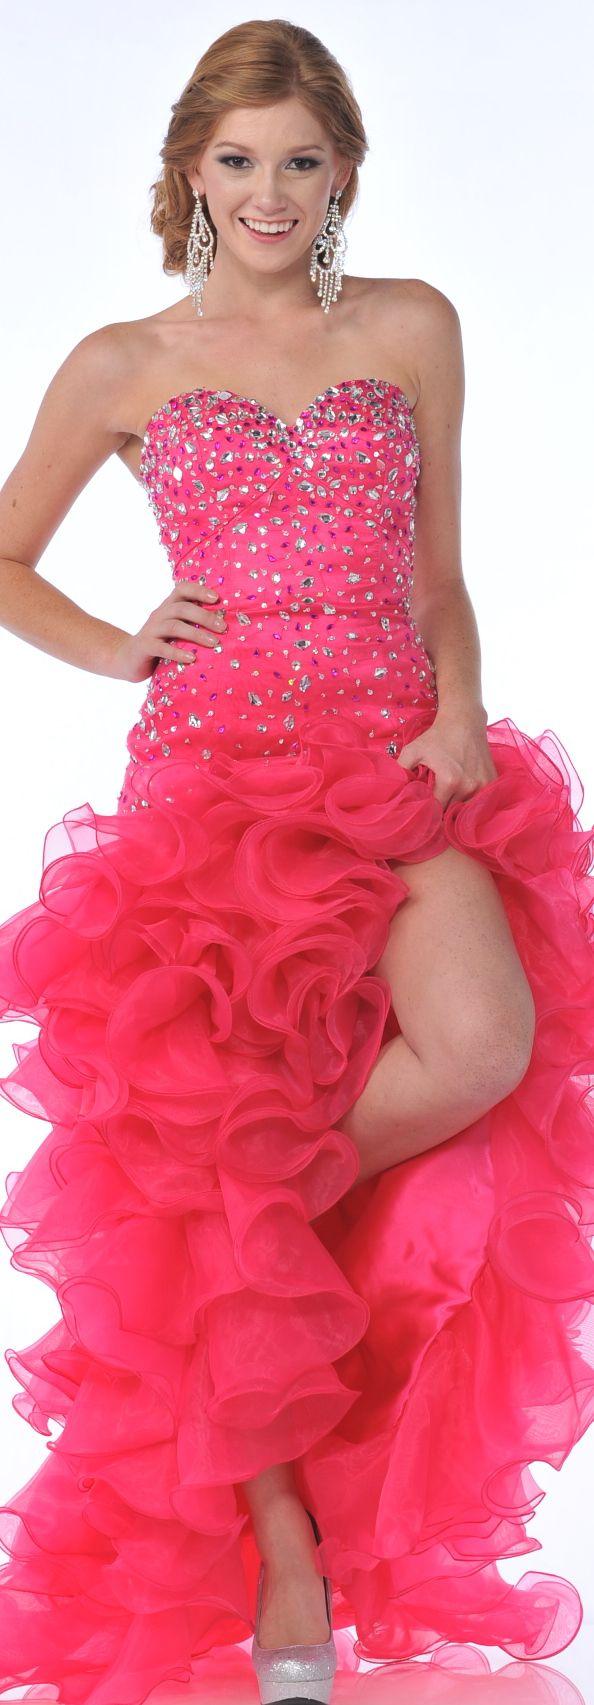 Prom dresseswinter ball dresses under smashing under